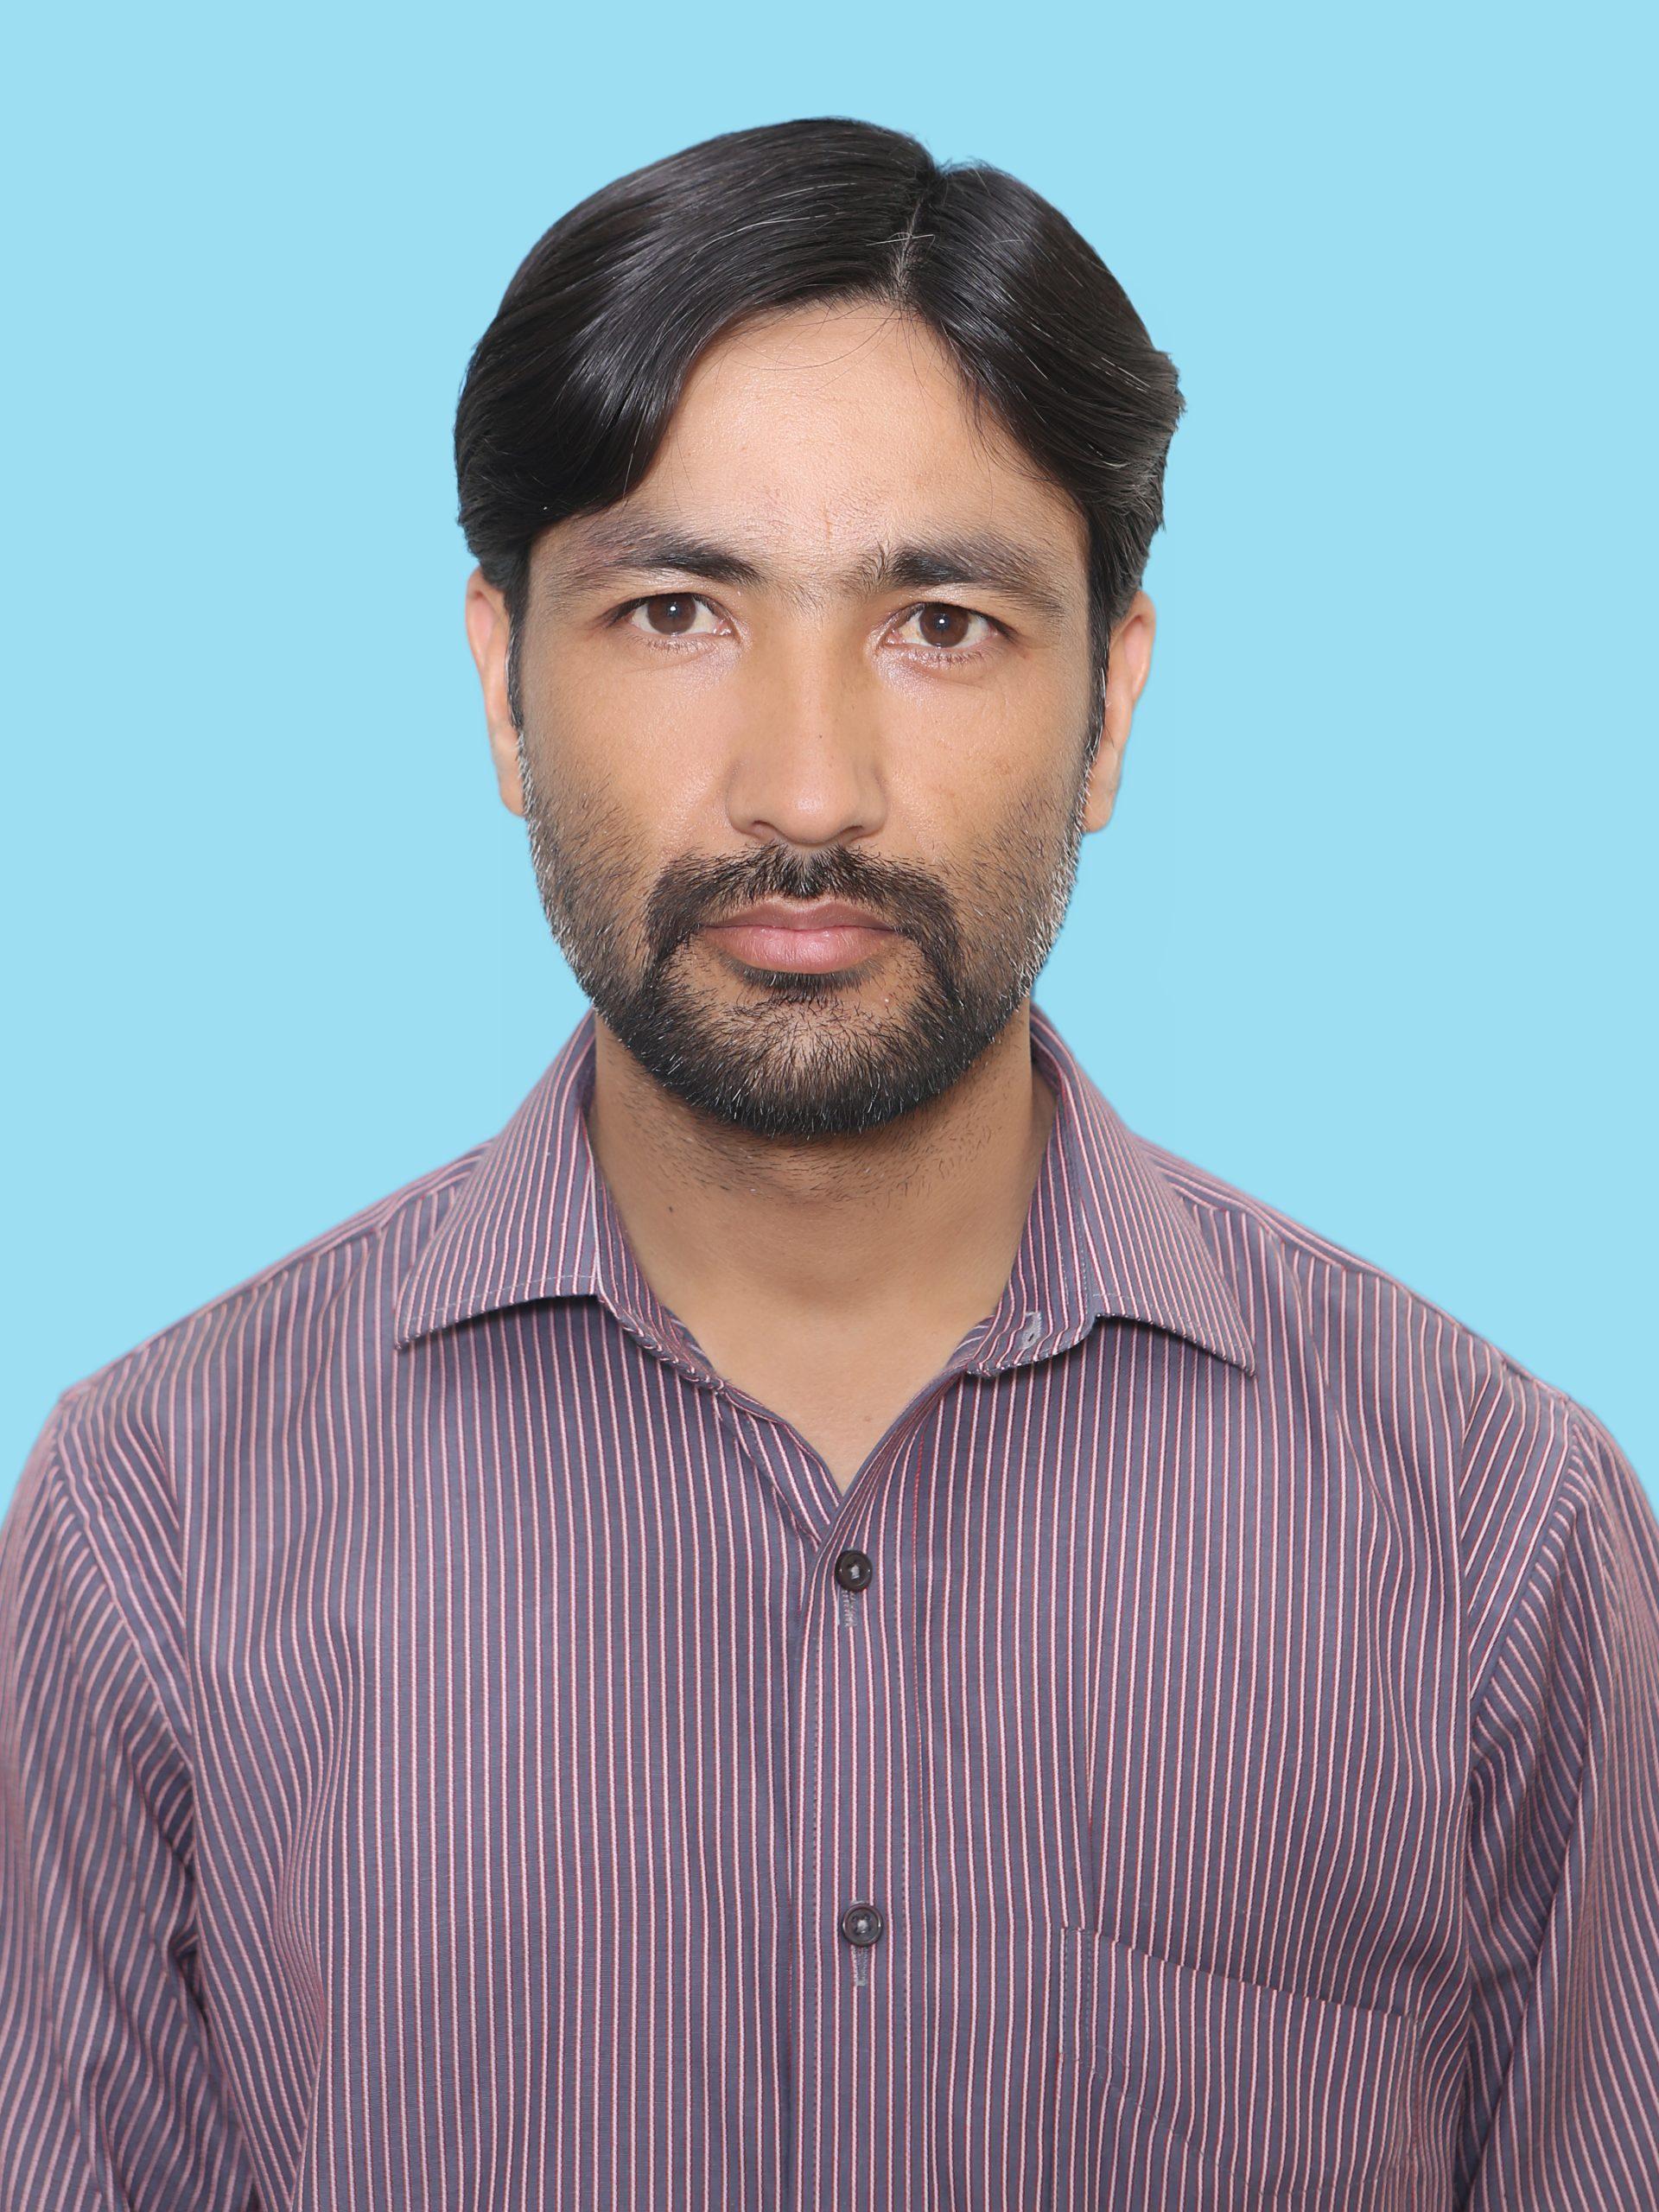 Dr. Jabir Hussain